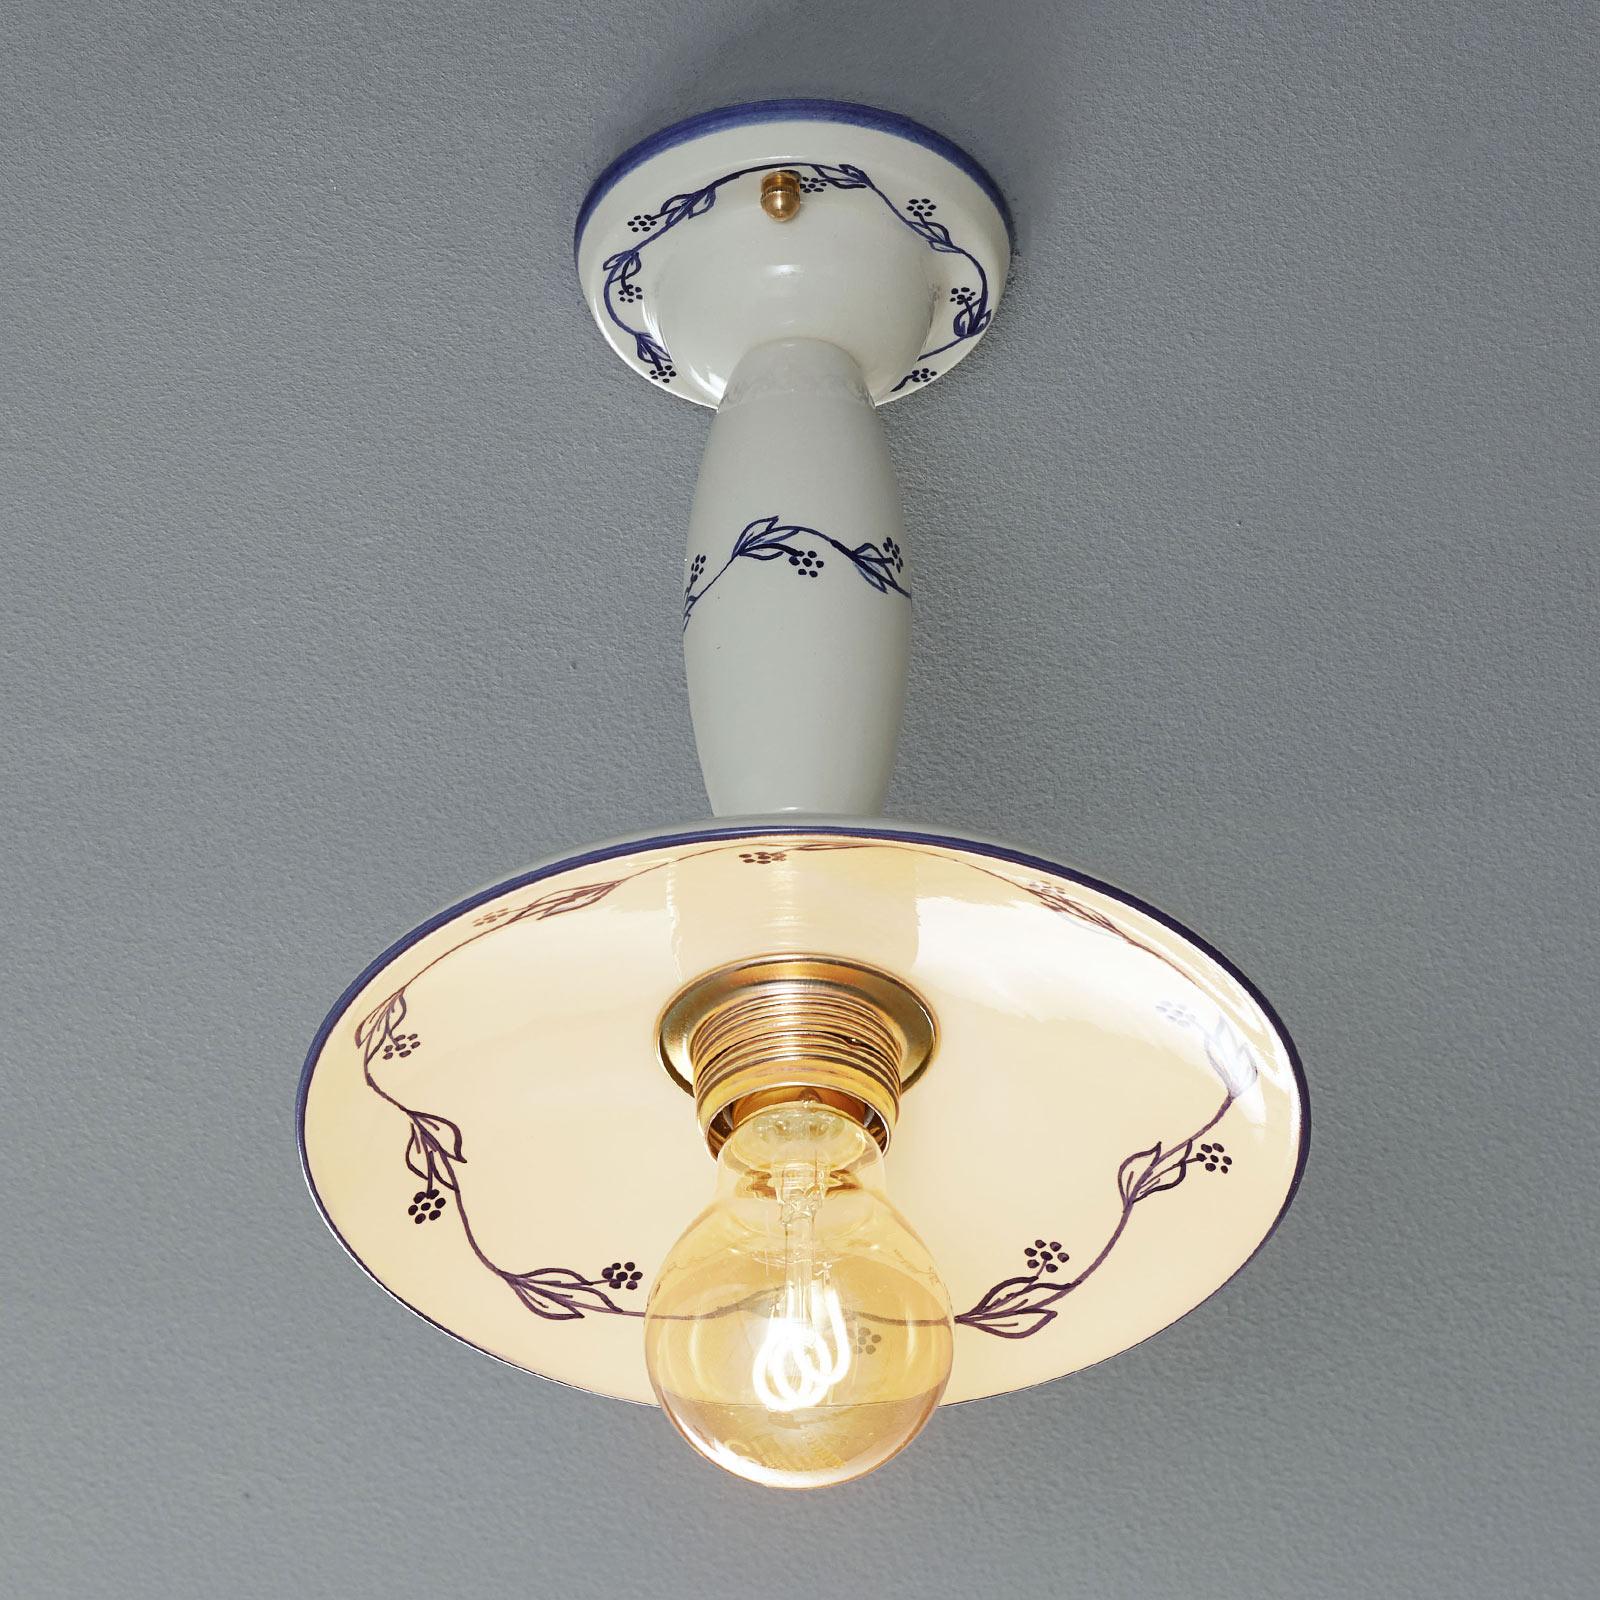 Keramieken plafondlamp met tussenruimte - Ribes